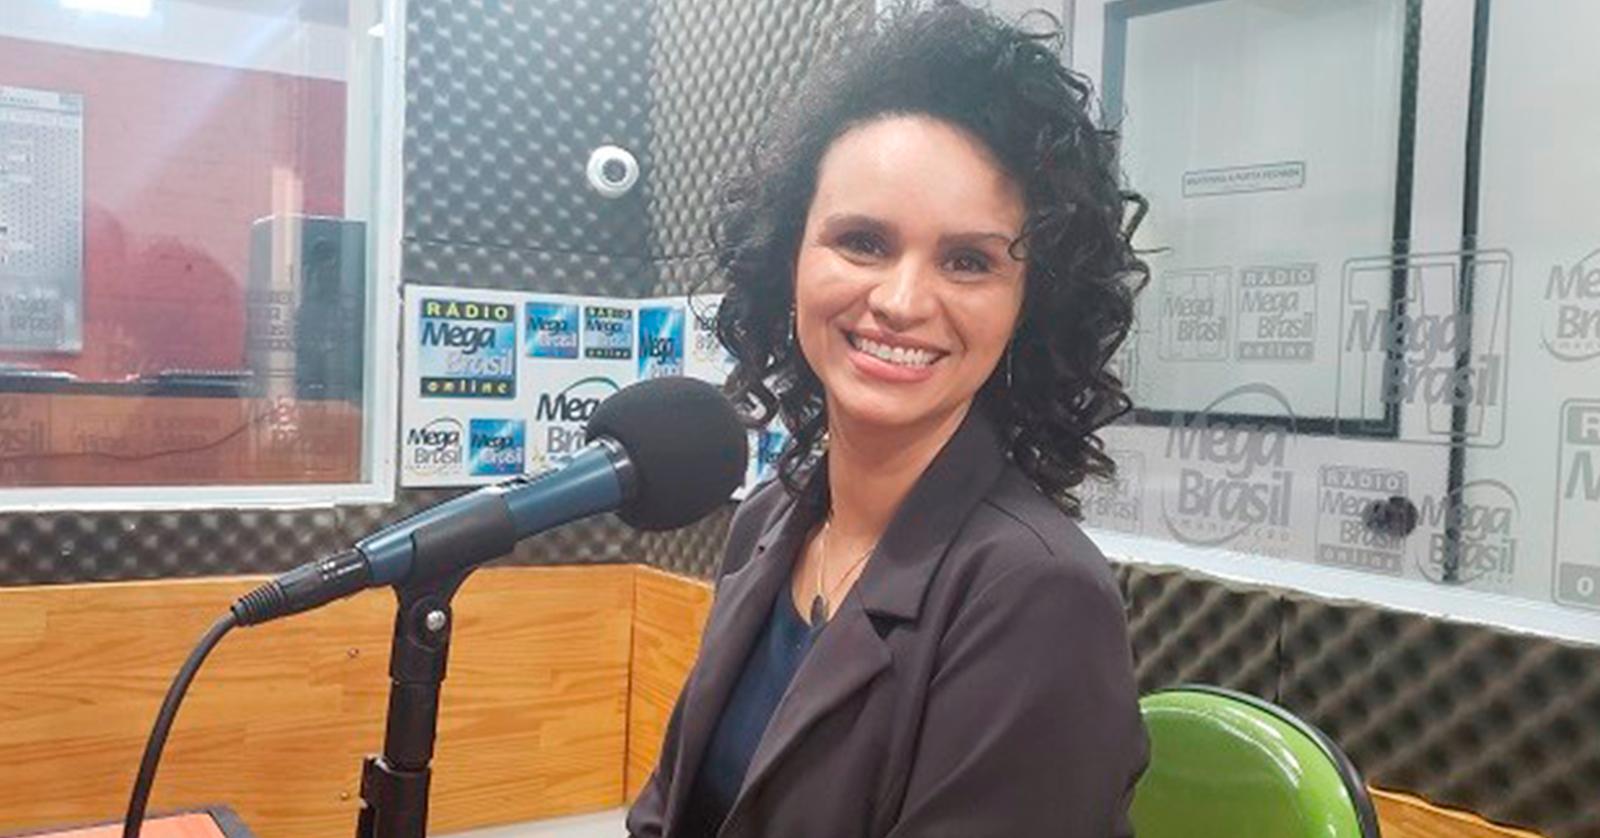 Bate-papo na rádio: Comportamento das empresas e consumidores na Black Friday